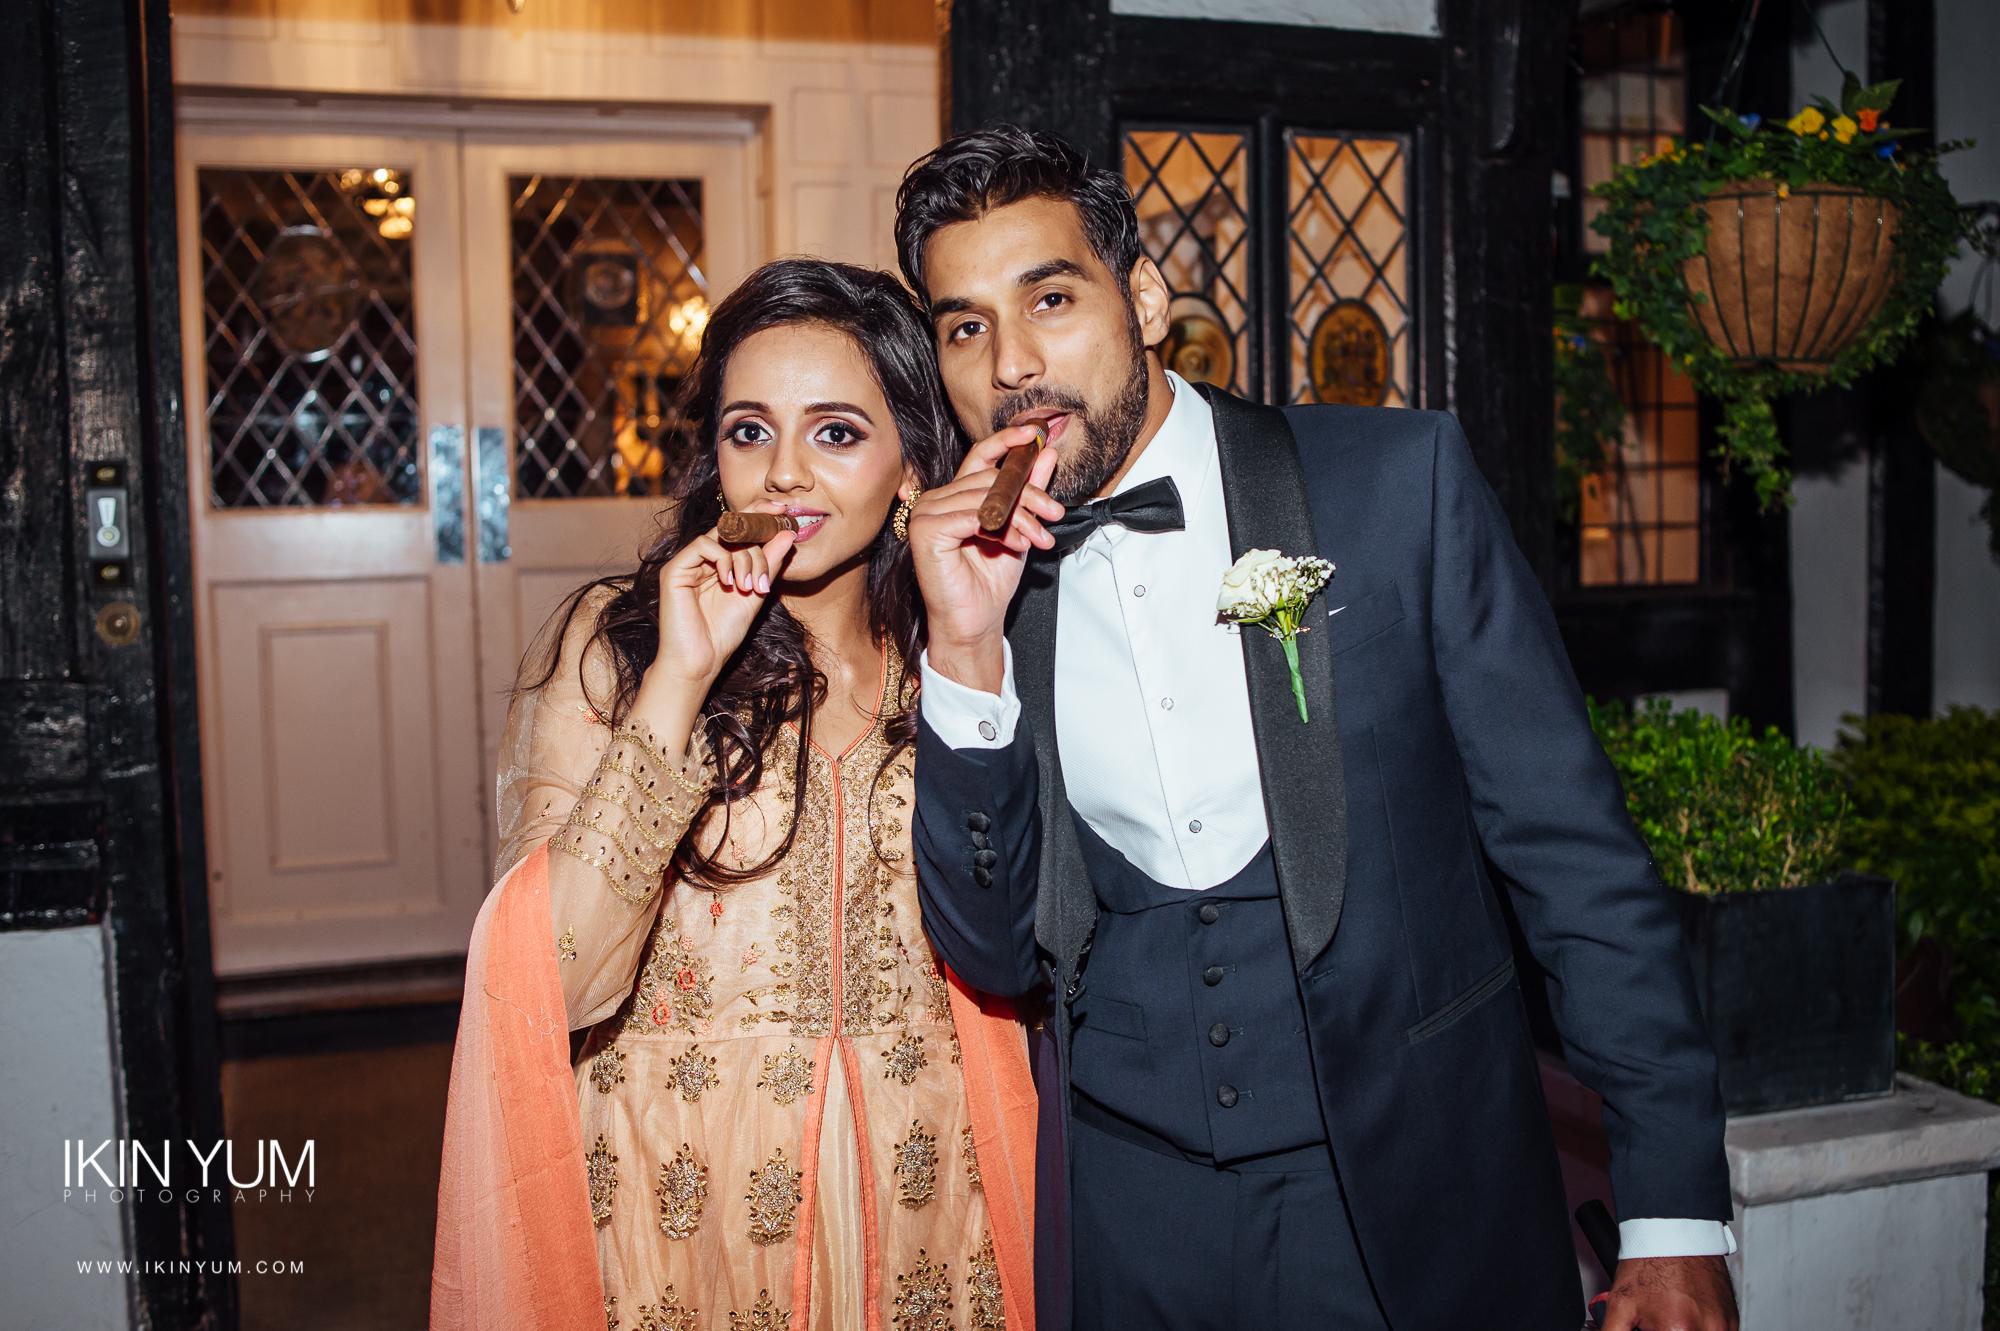 Laura Ashley Manor Wedding - Ikin Yum Photography-134.jpg